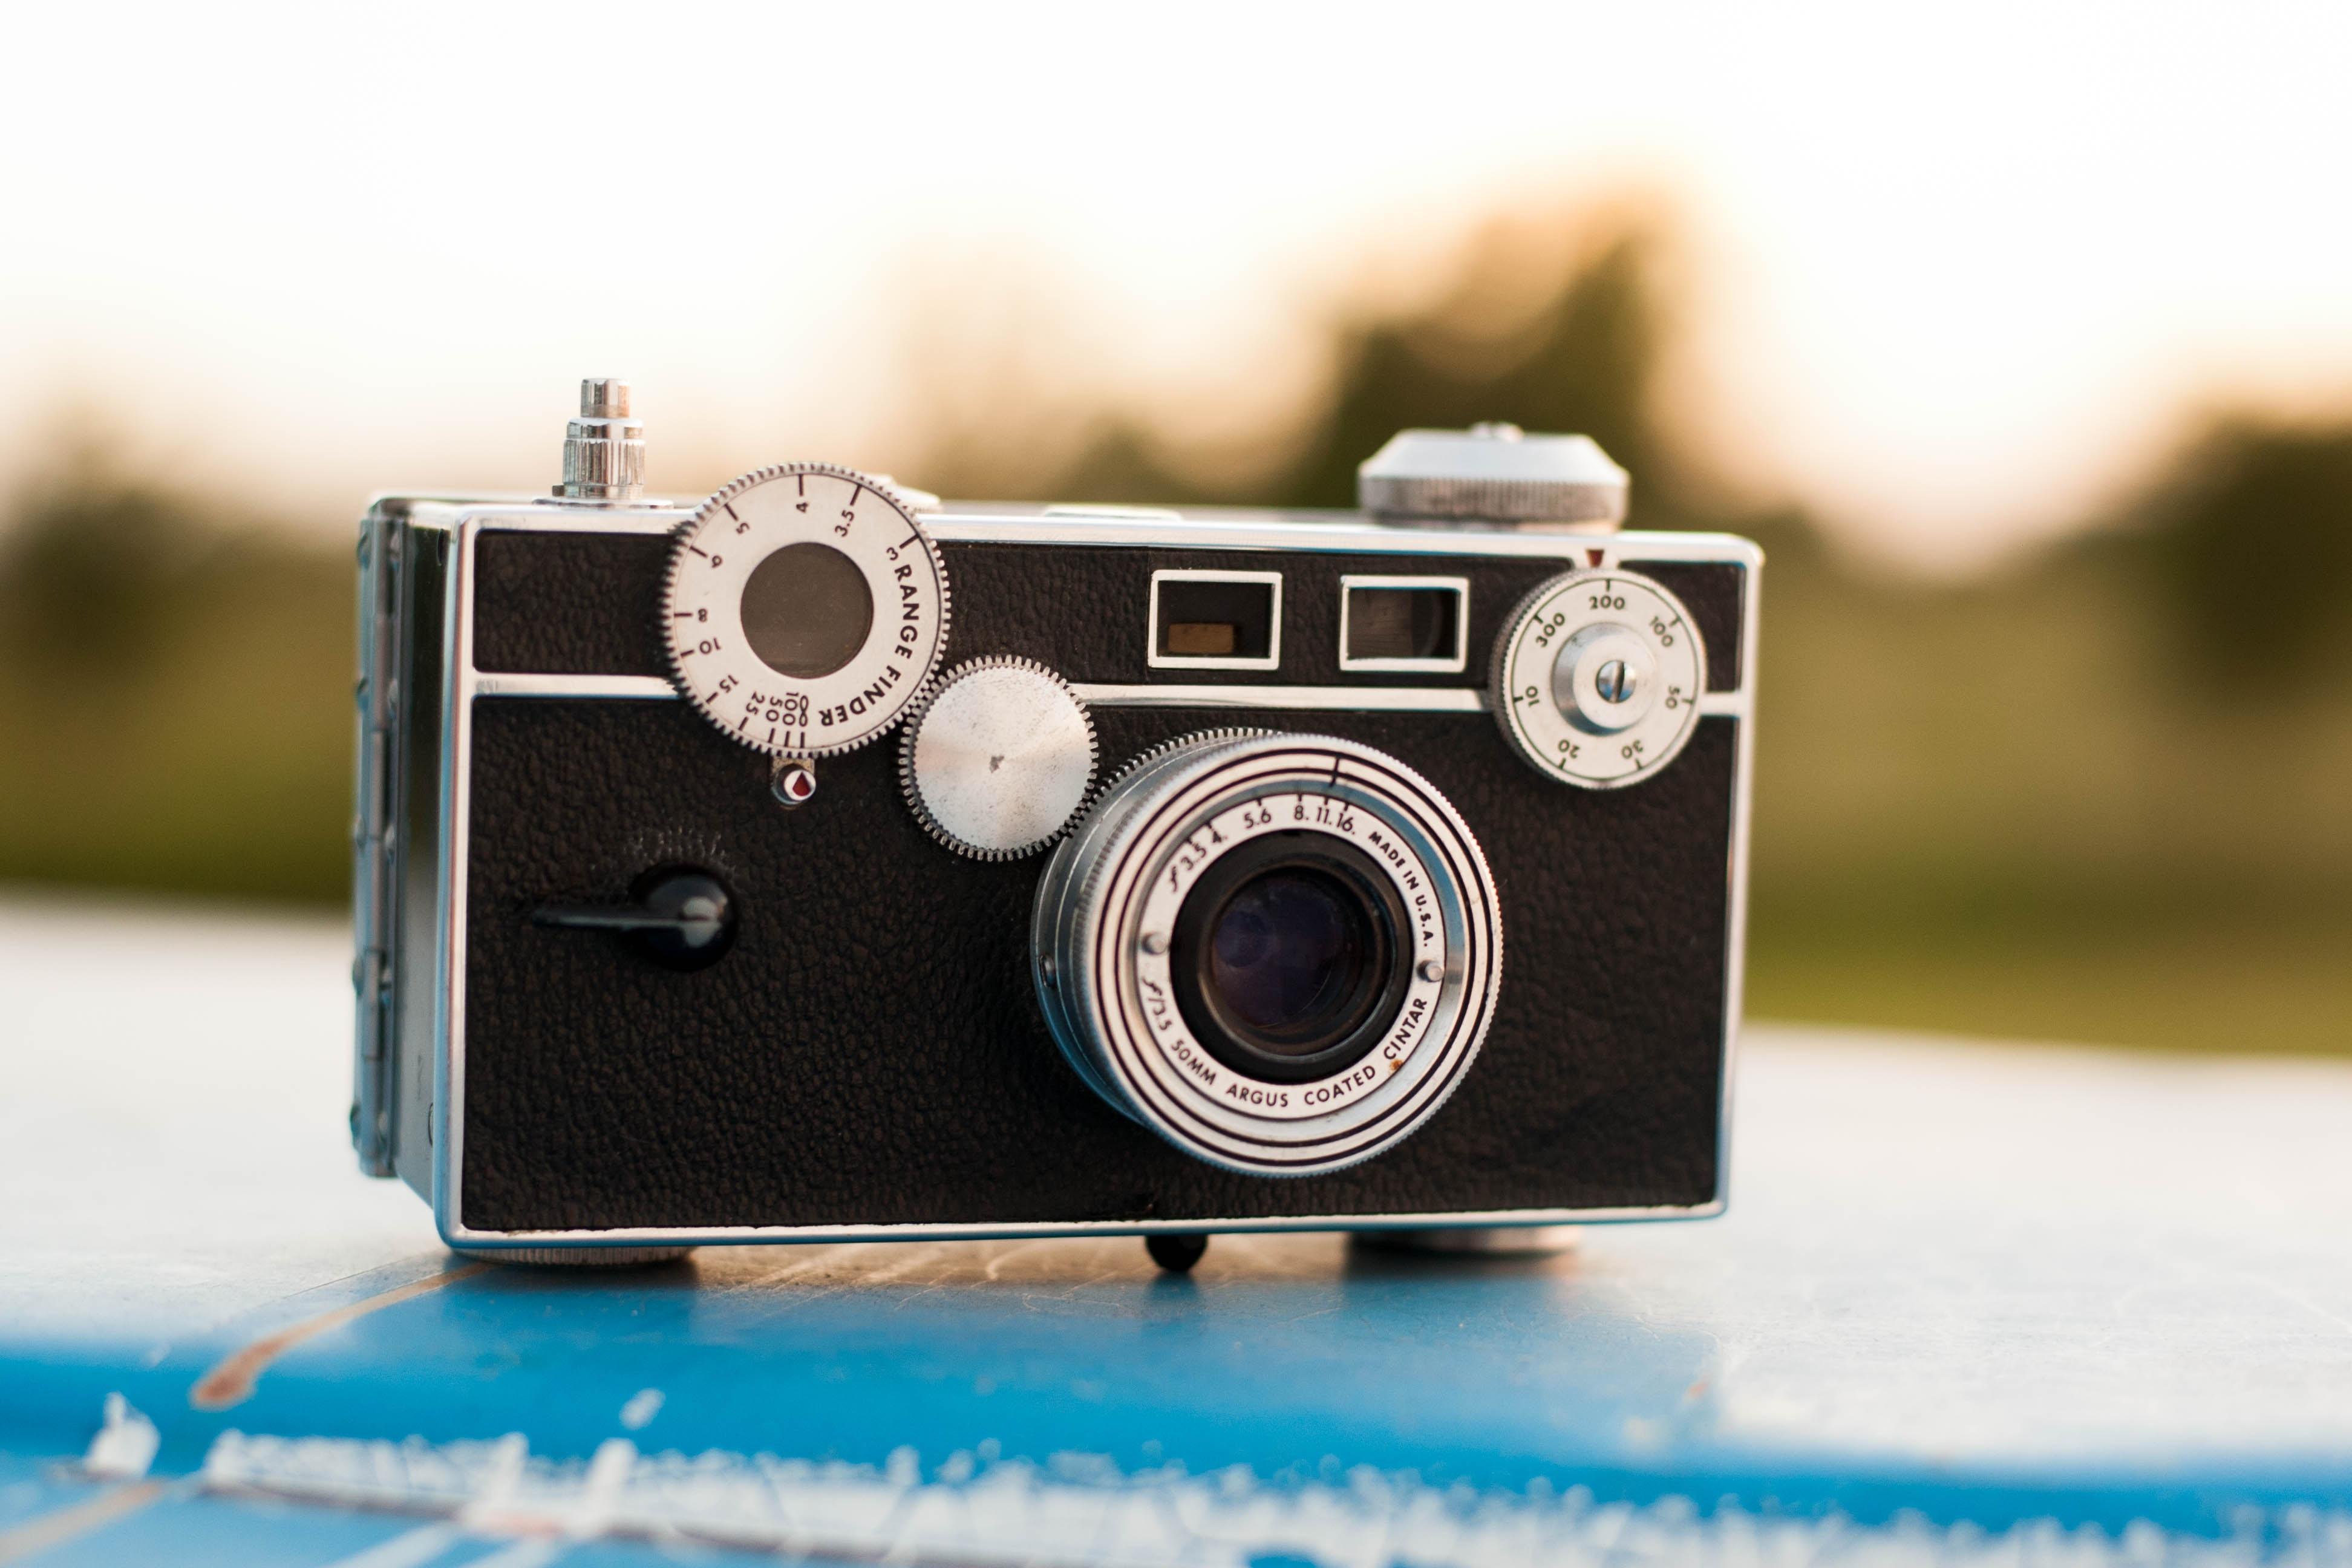 photo of black and white camera